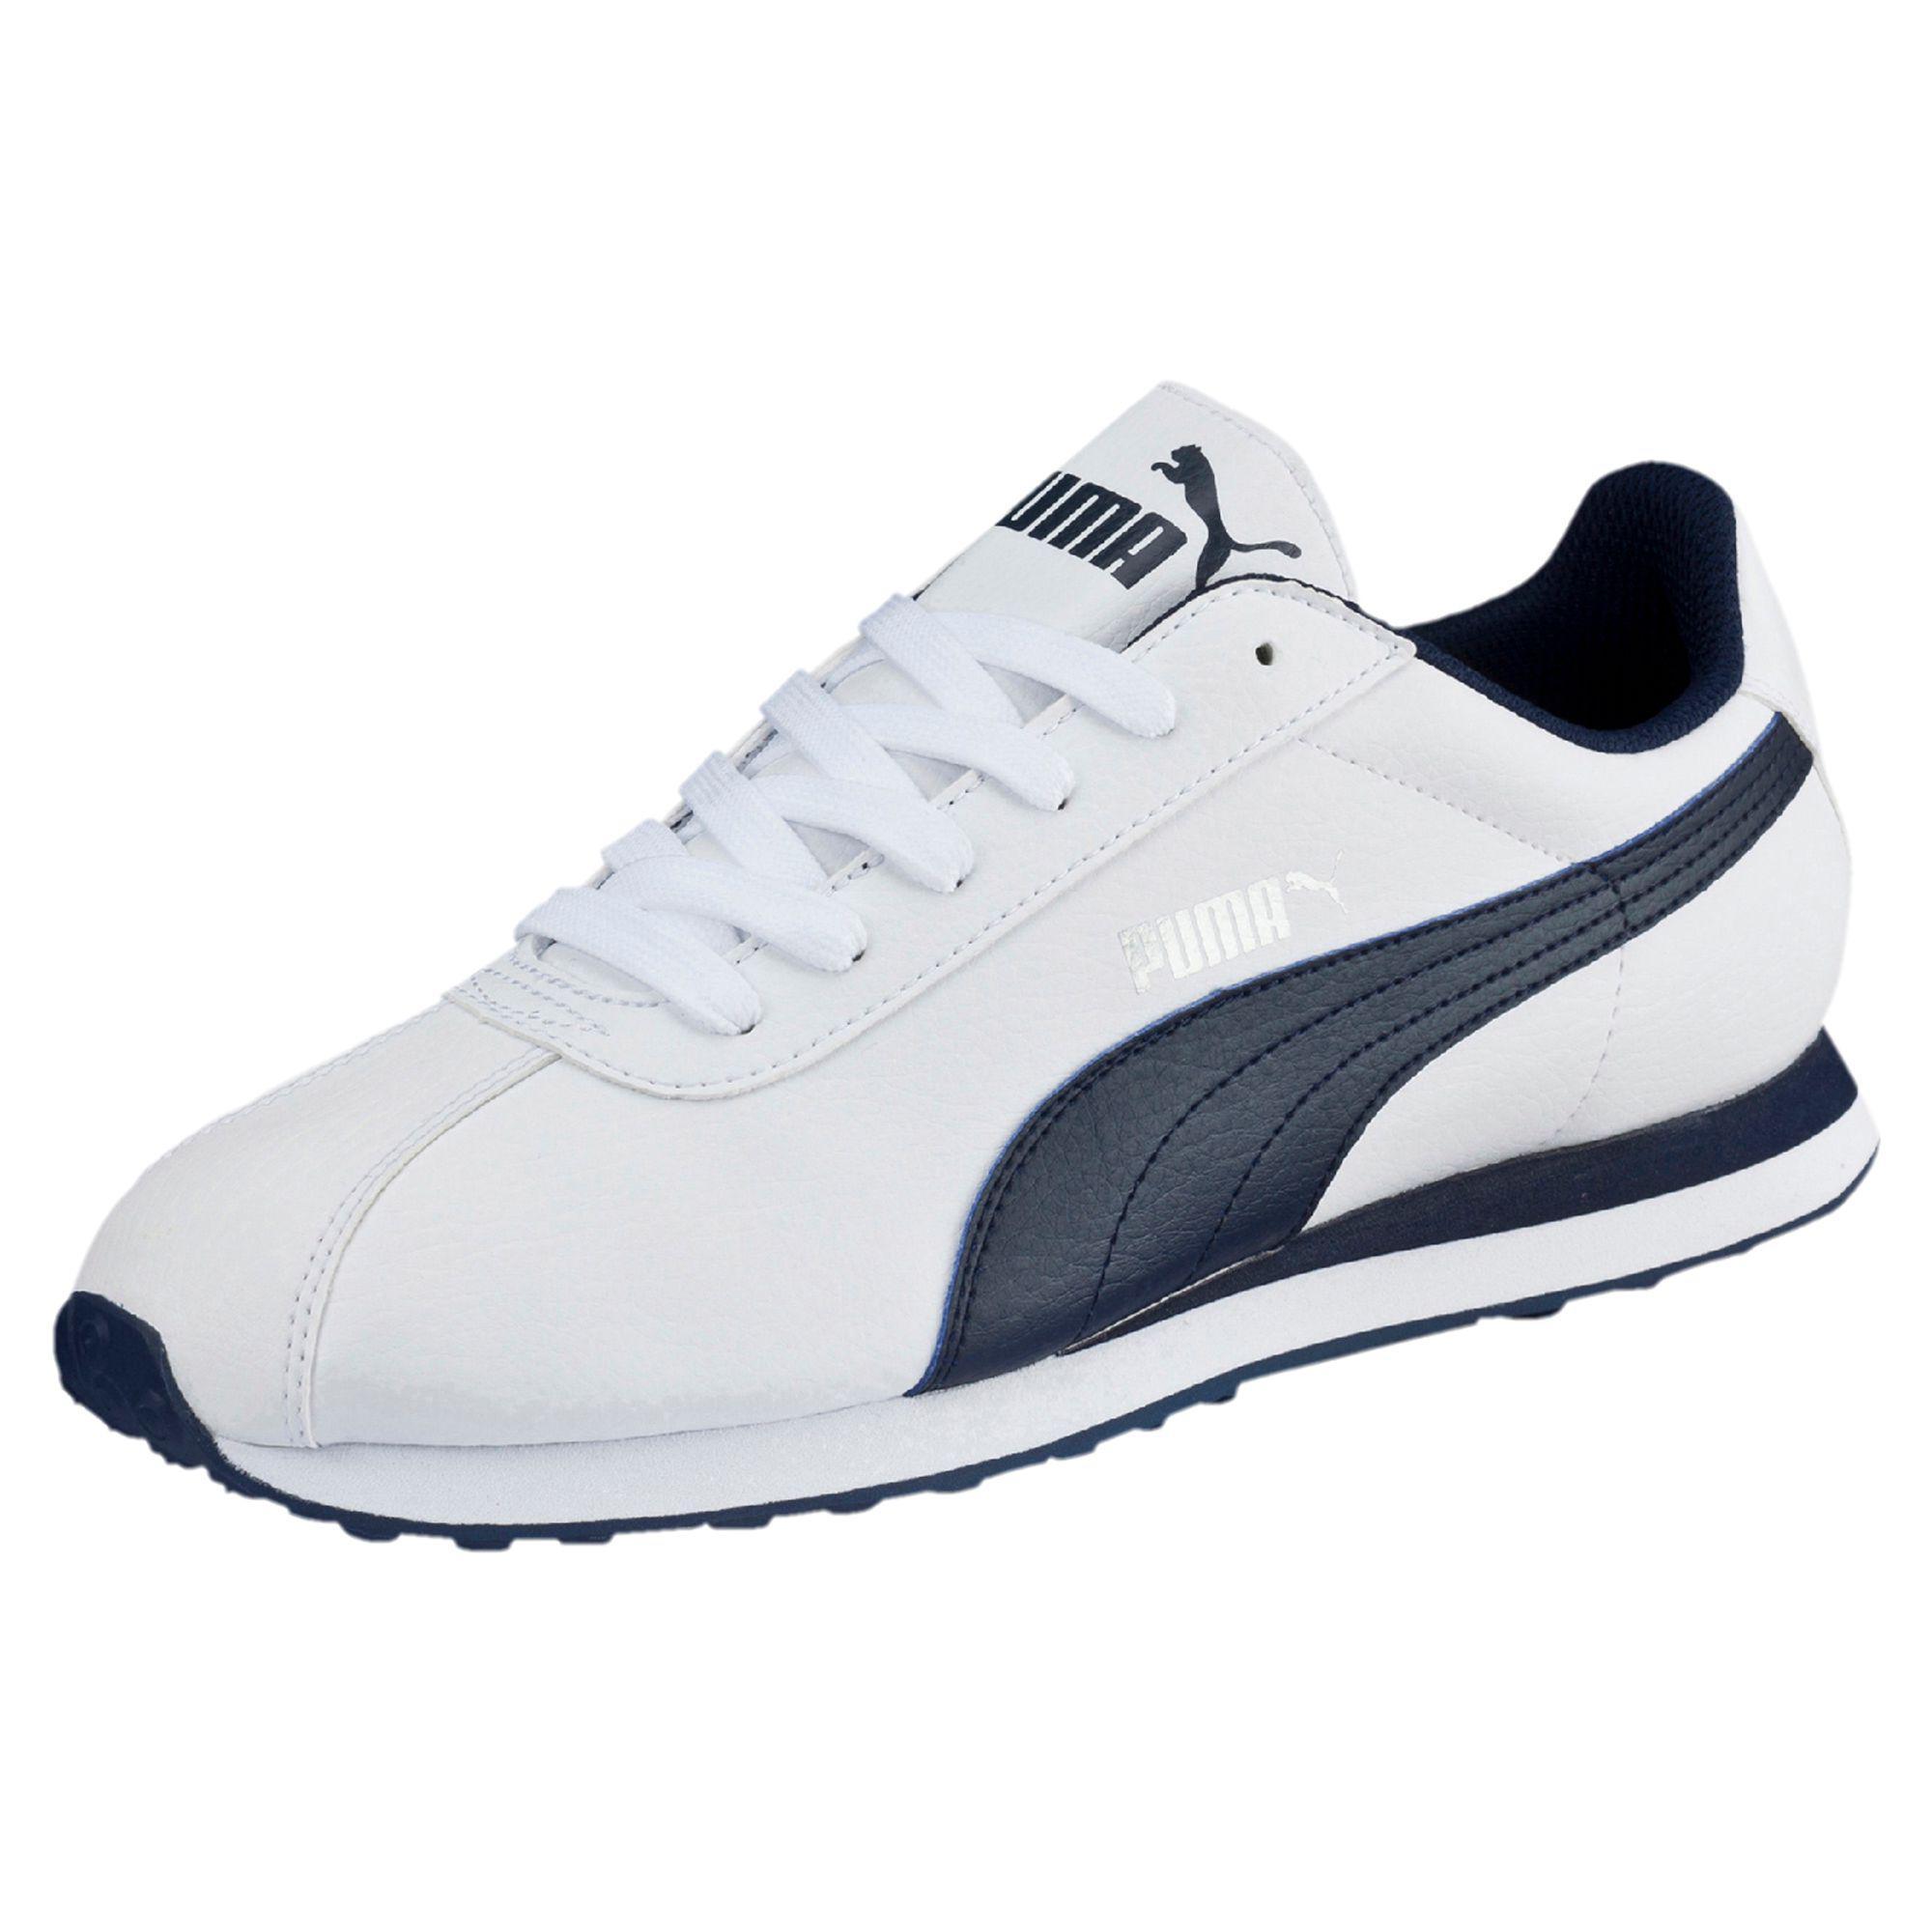 PUMA Men's Turin Fashion Sneaker, White-Dark Shadow, 11.5 M US